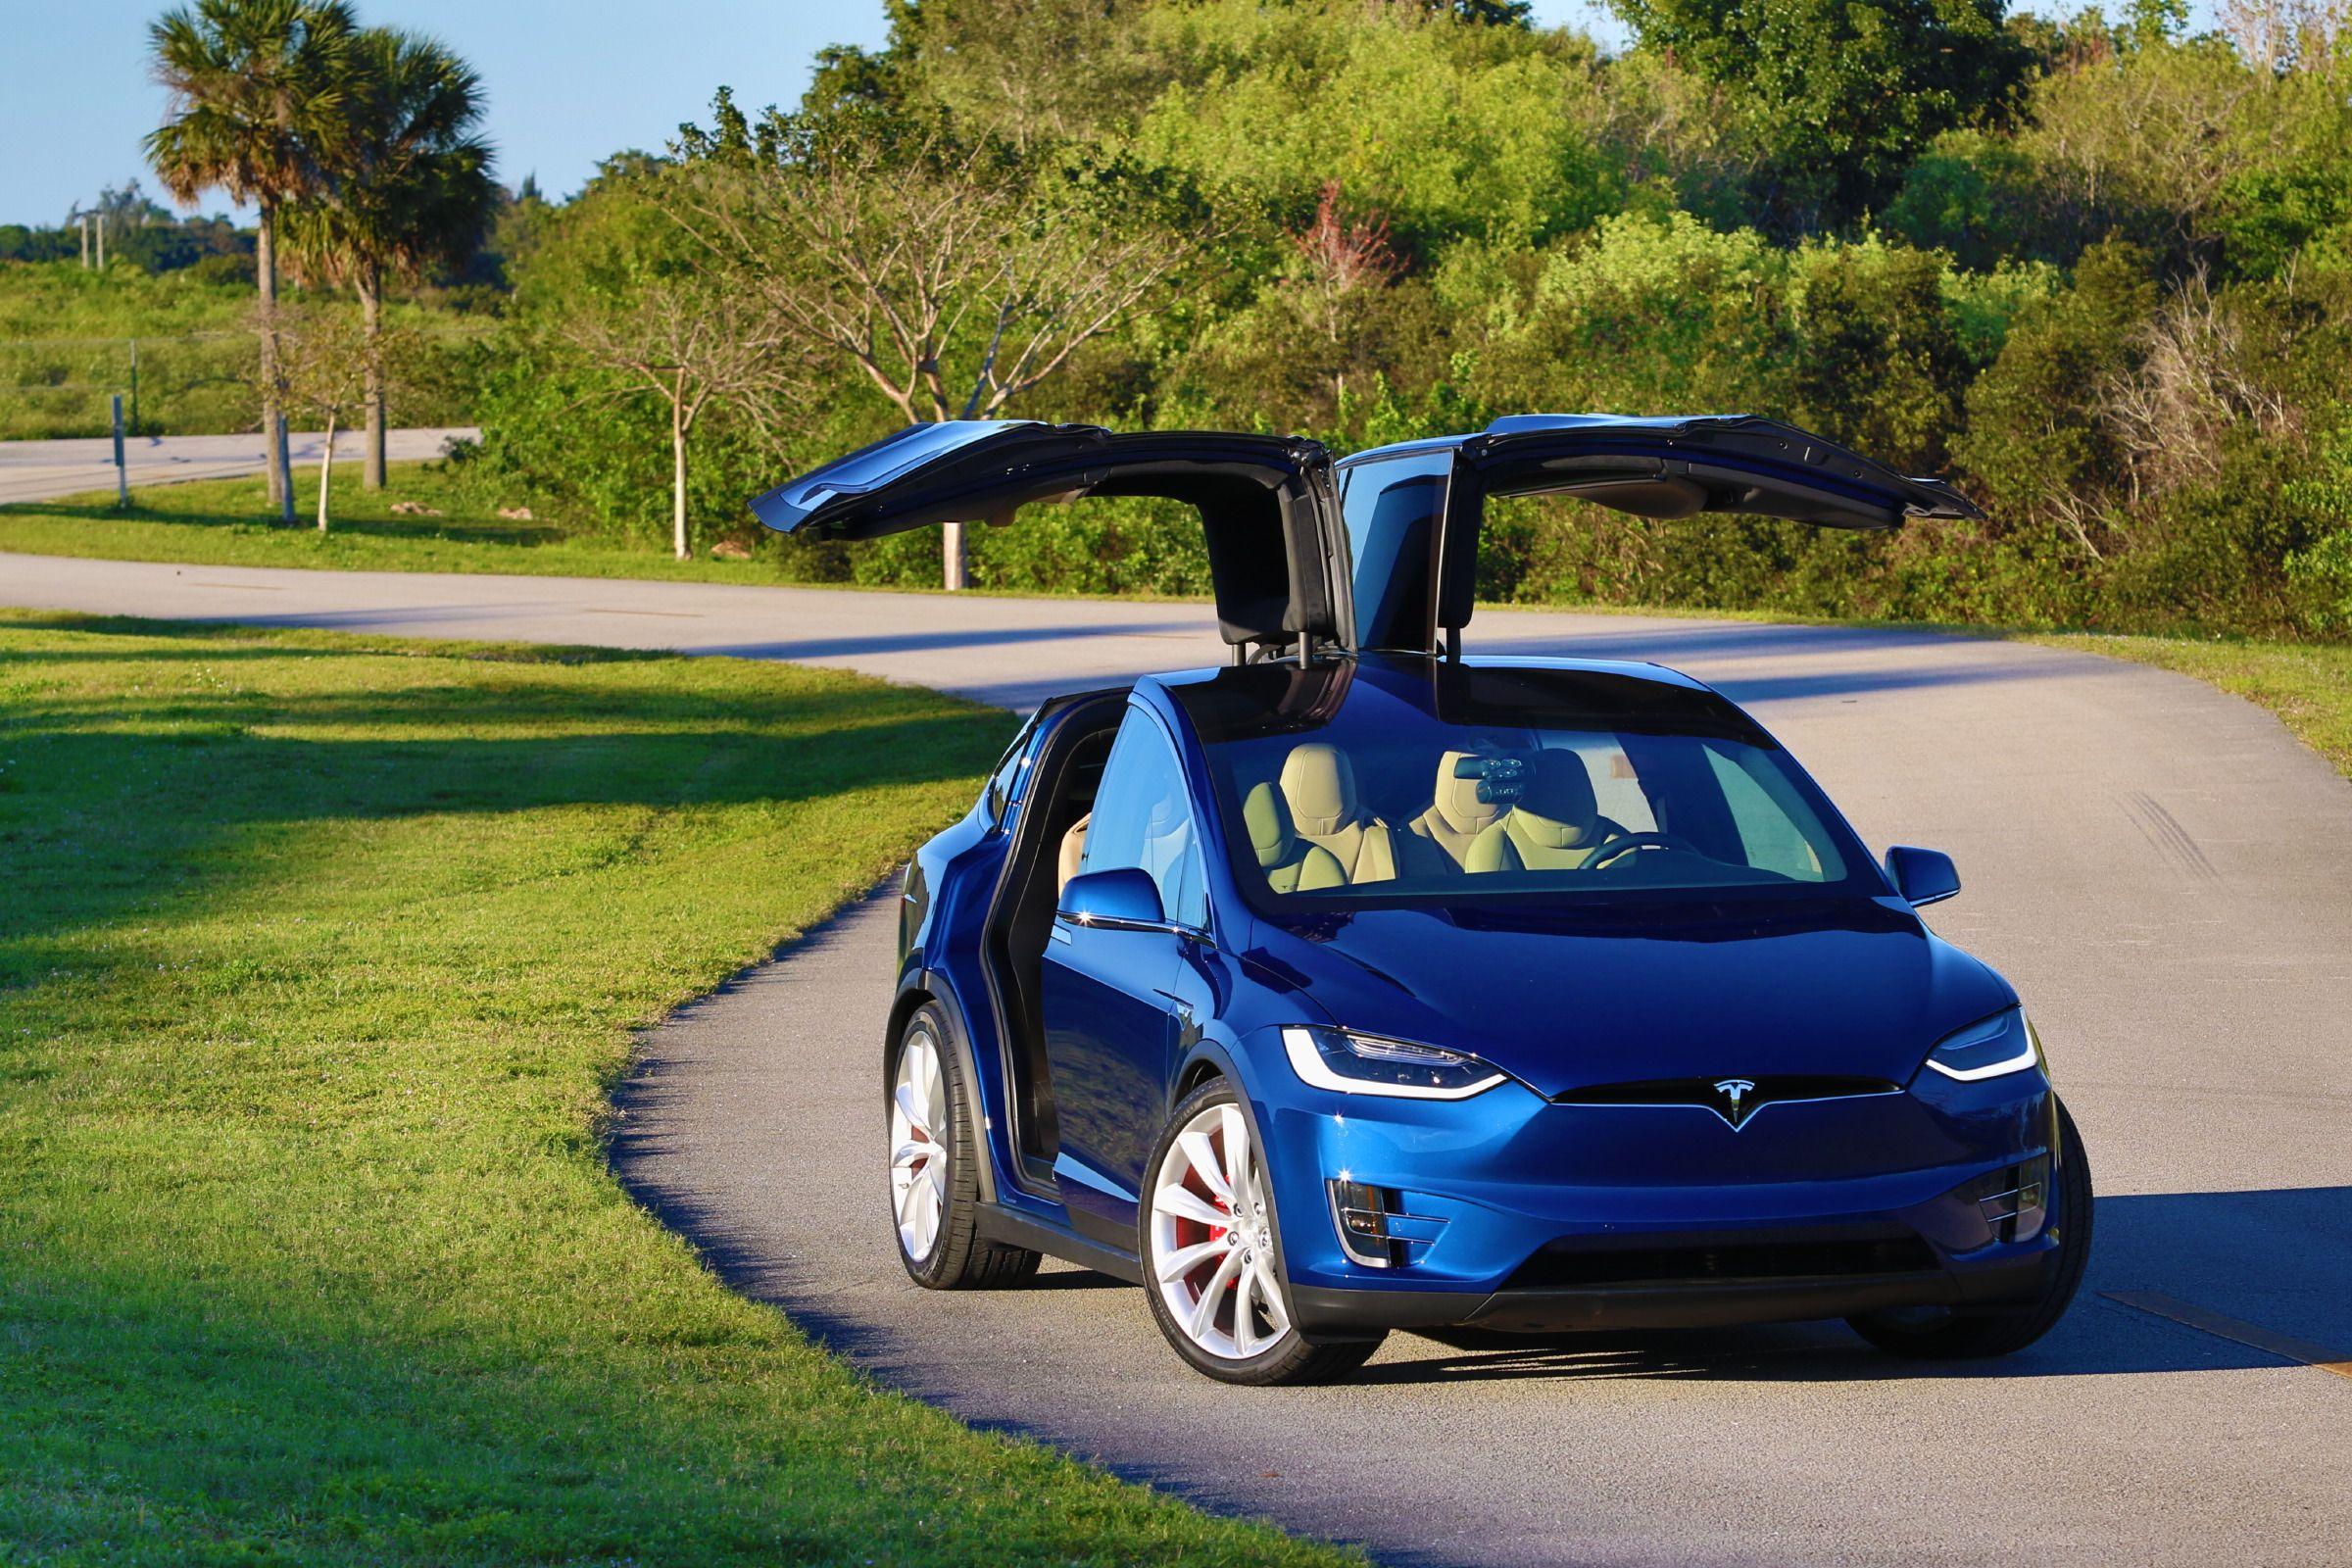 2016 tesla model x small electric suv price range - 2016 Tesla Model X Deep Blue Metallic Picture Gallery